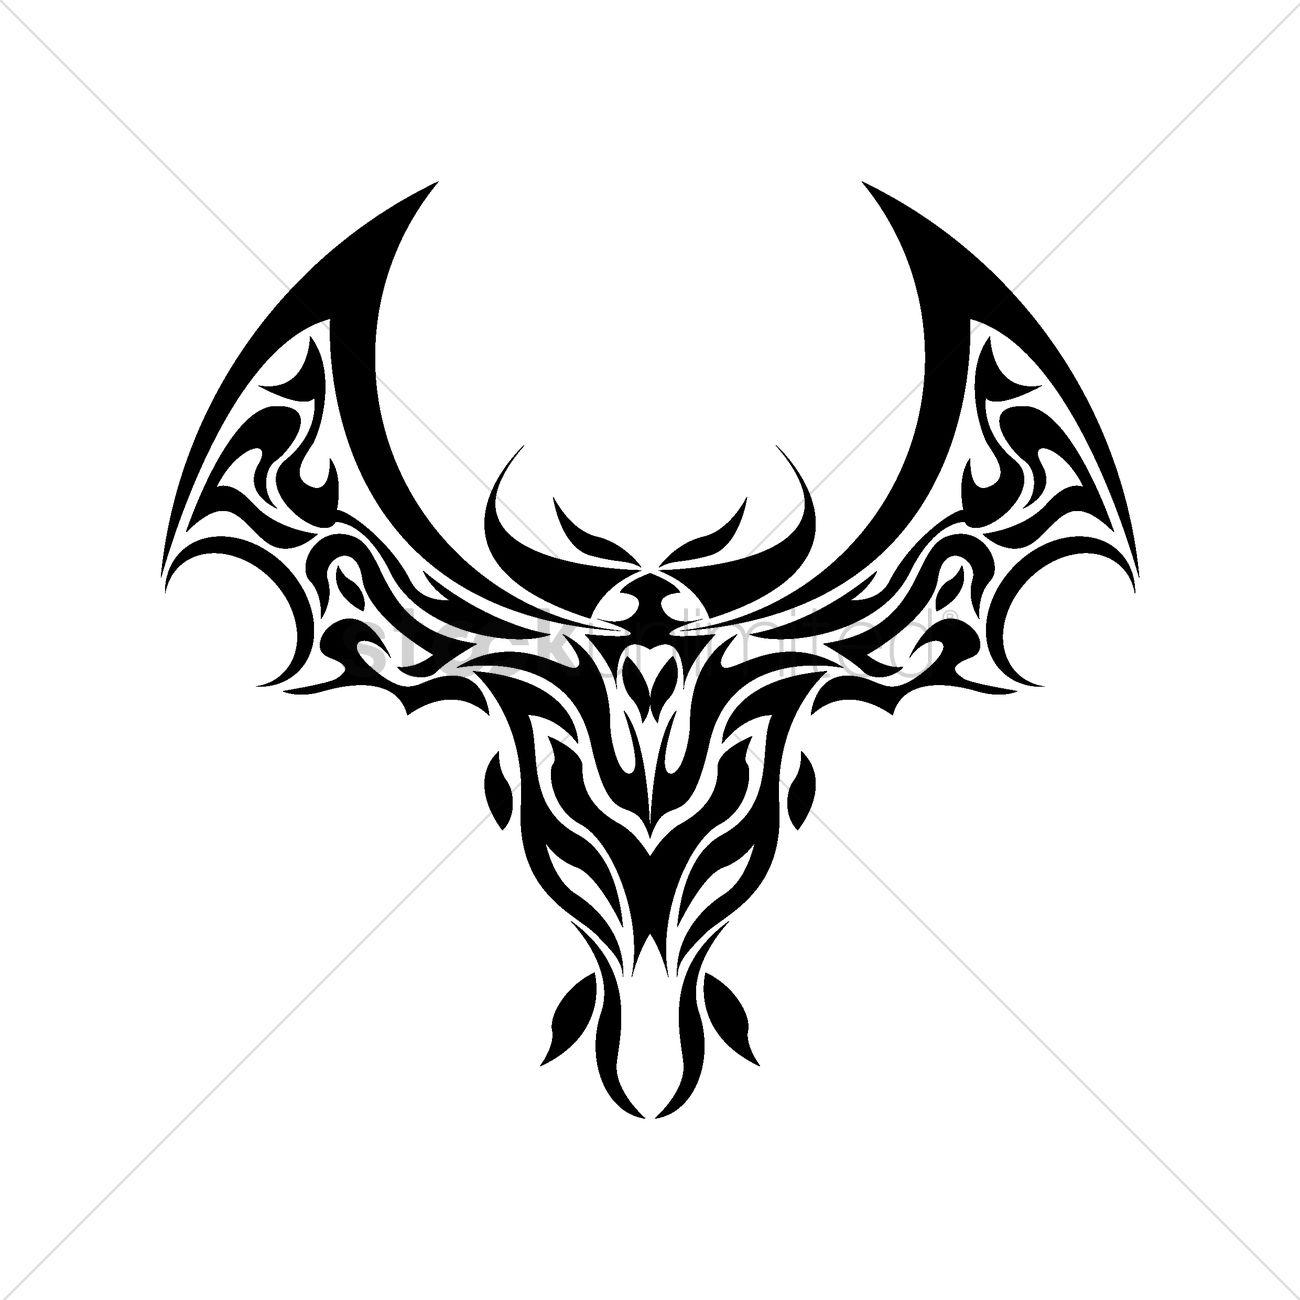 Bat Tattoo Design Vector Image - 1435573